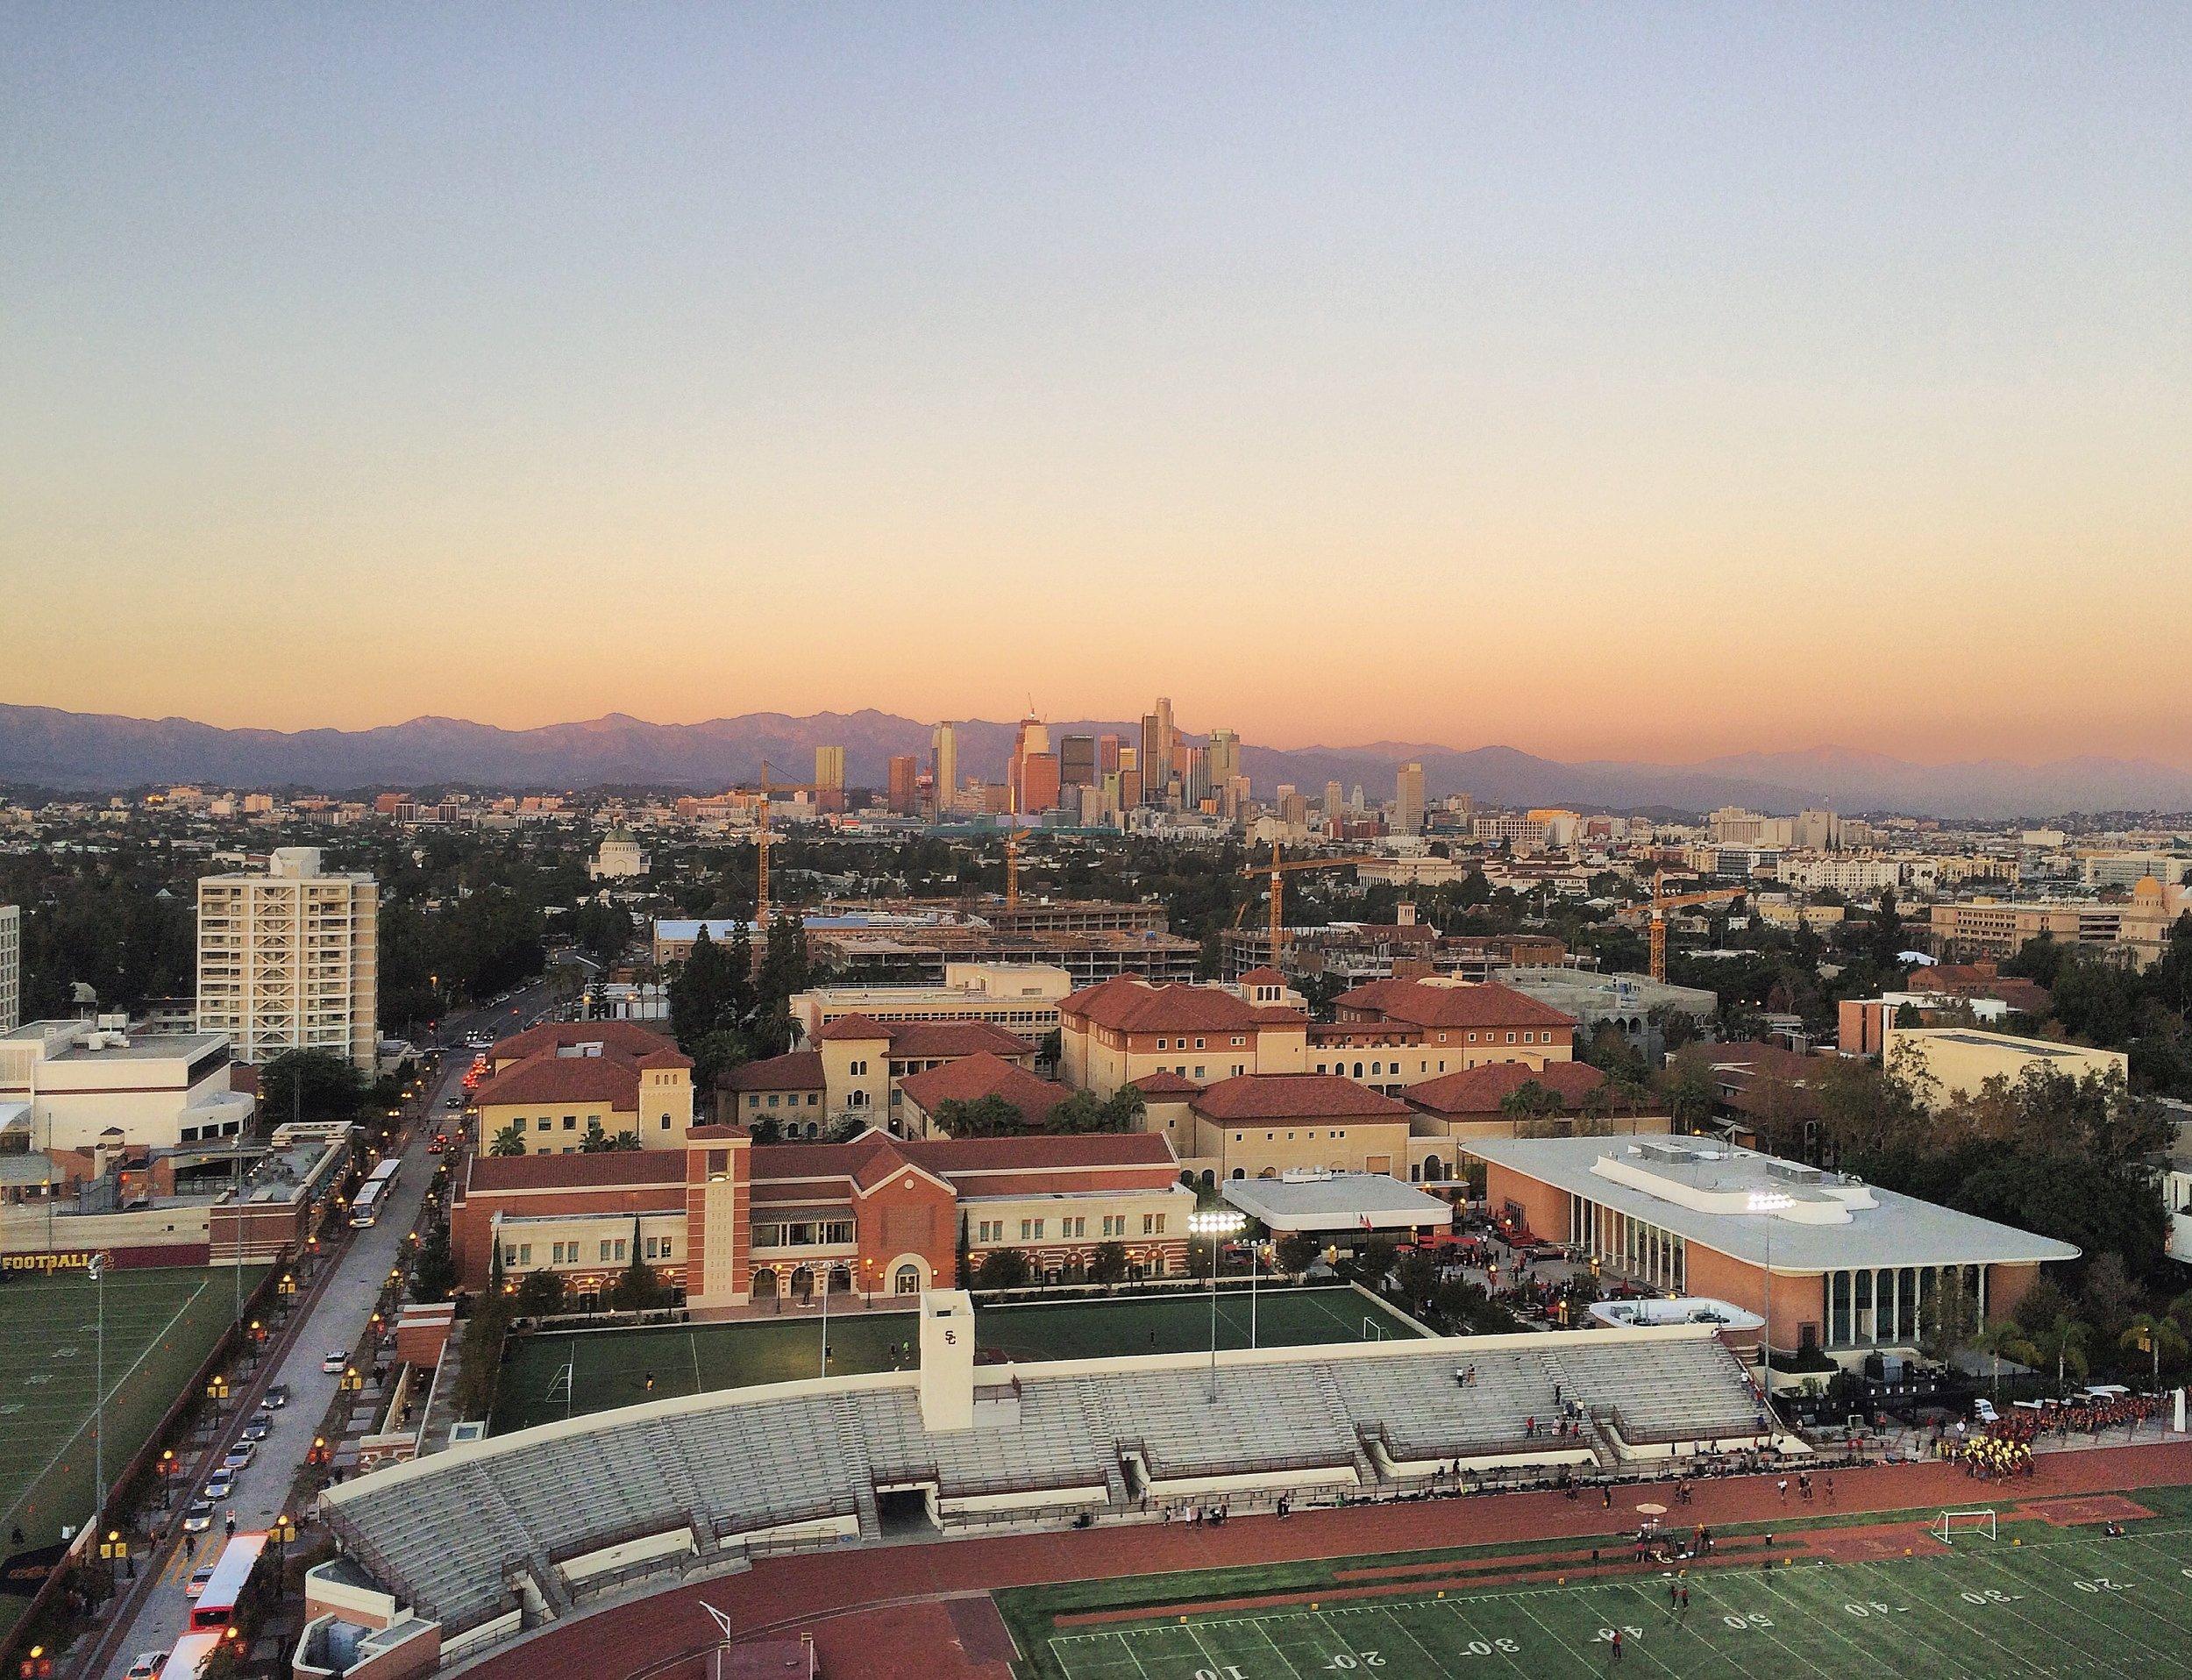 USC, Los Angeles